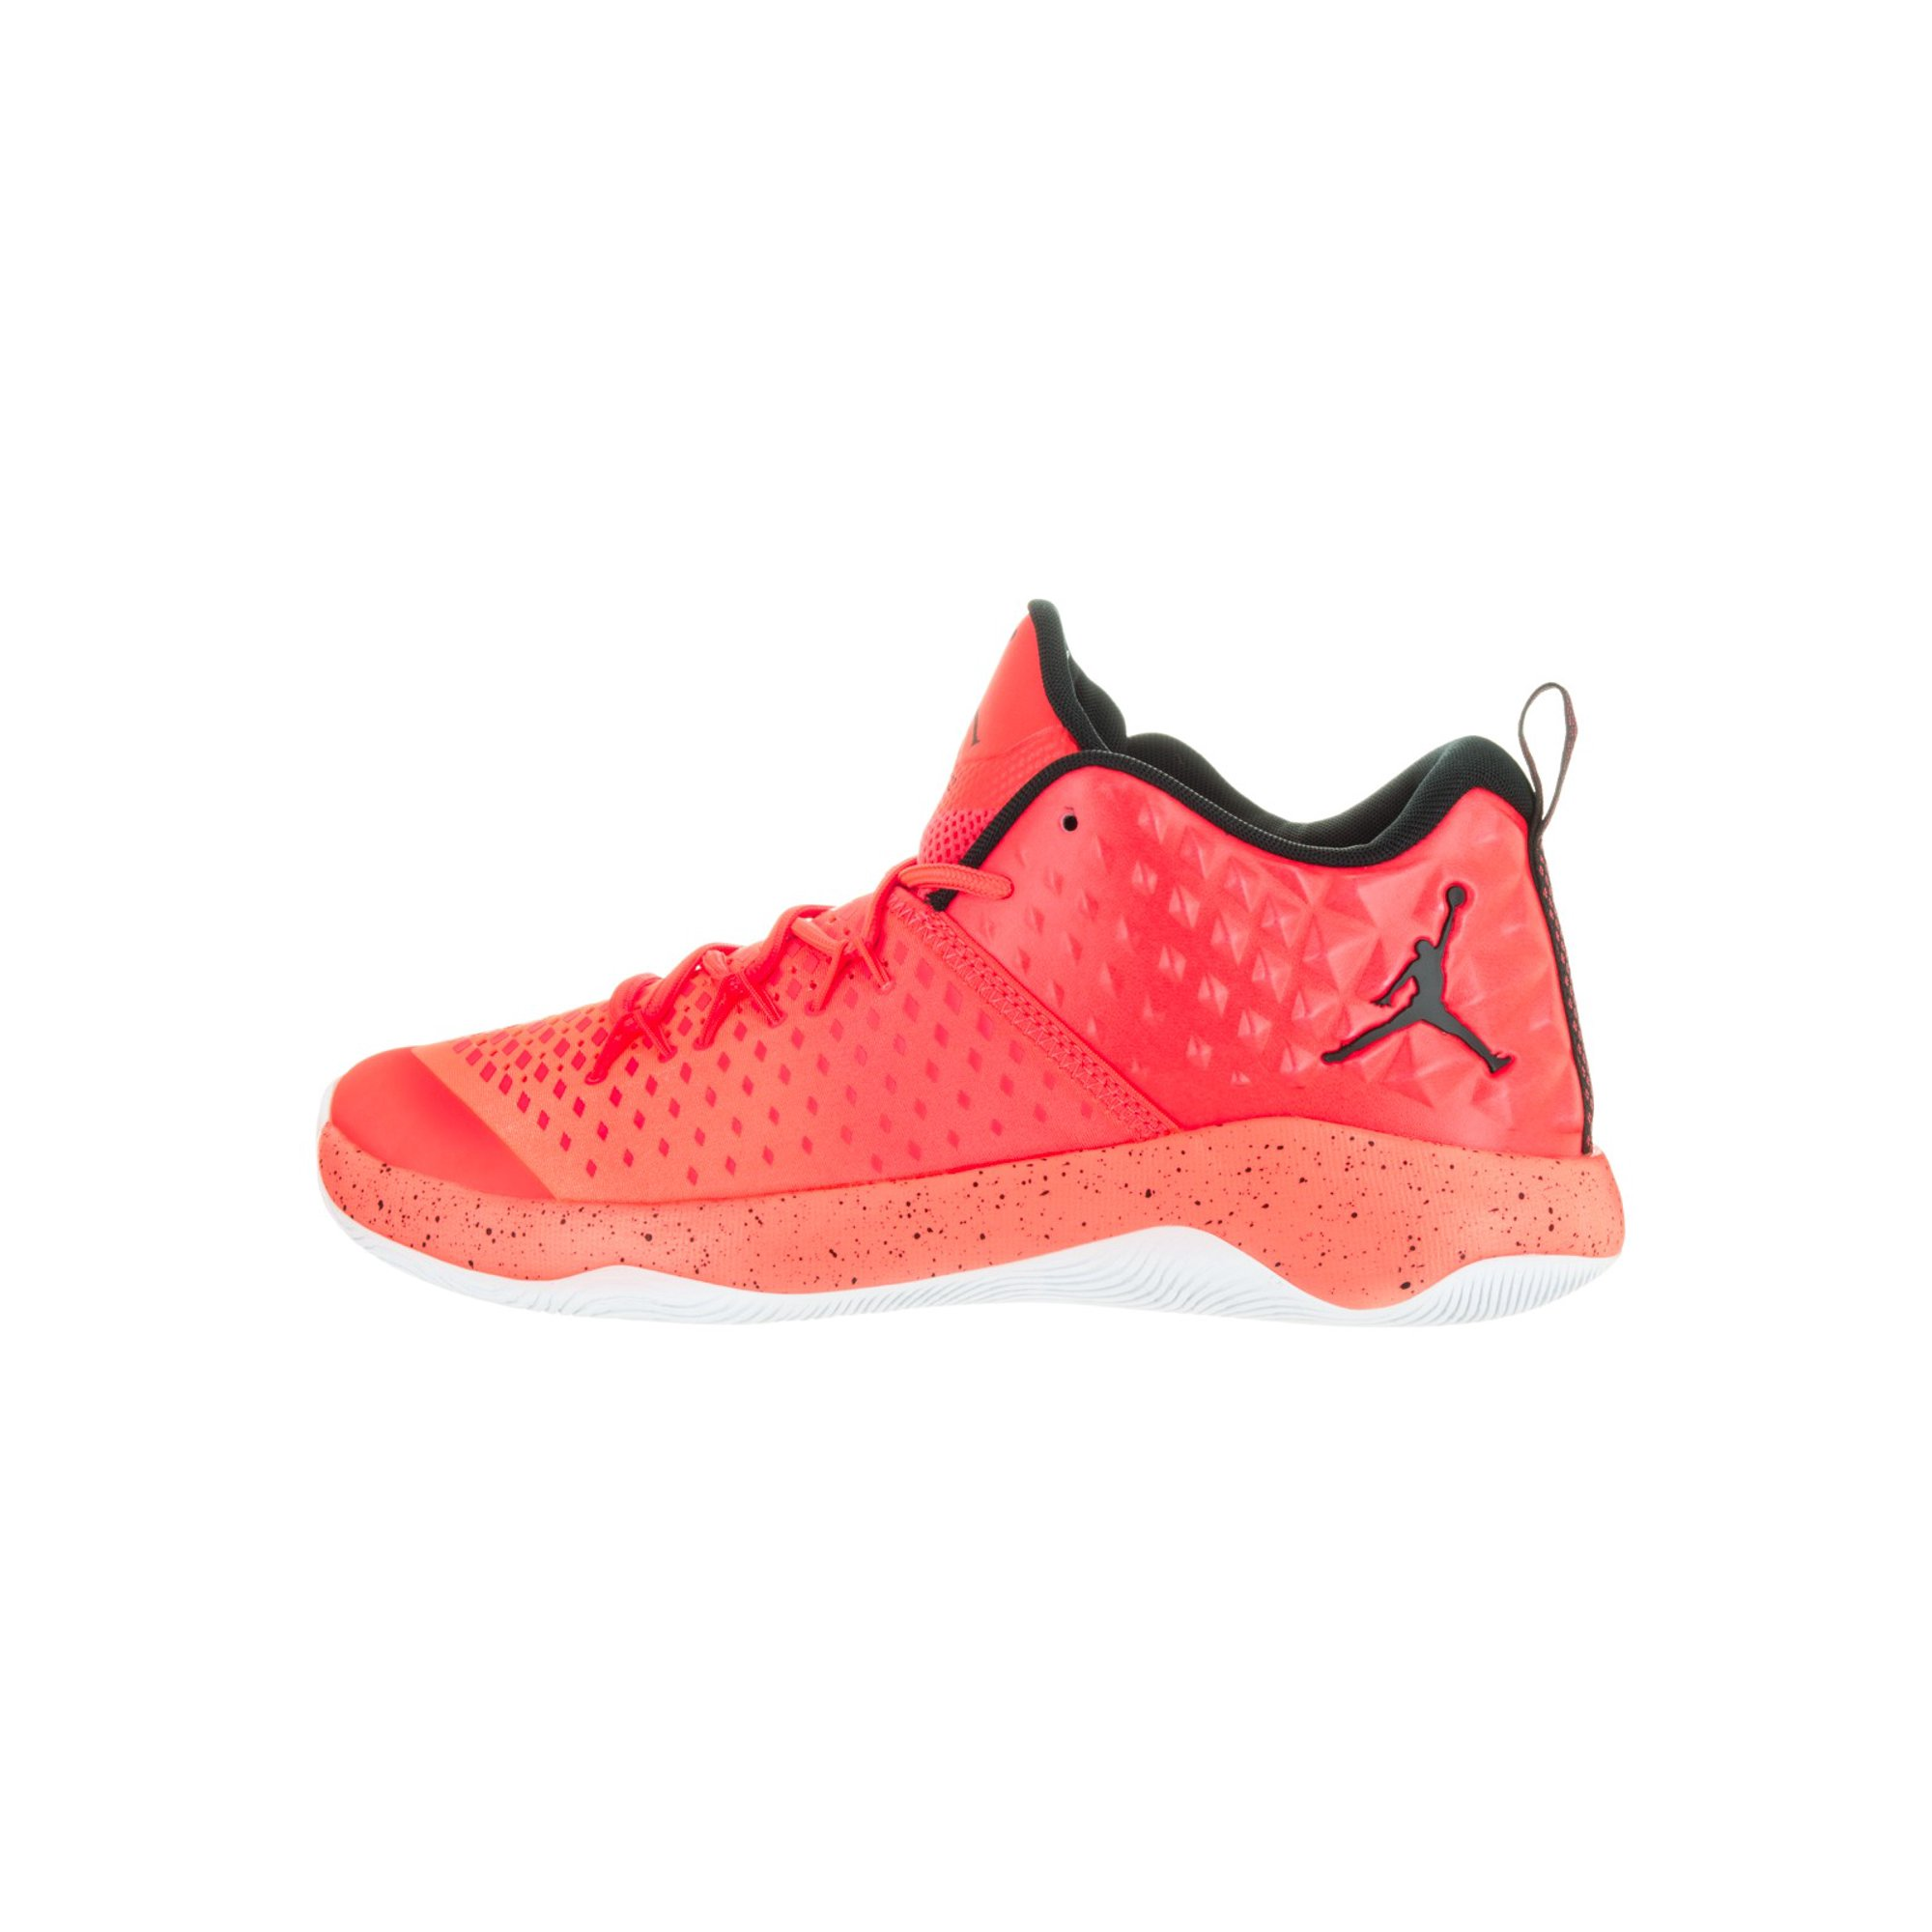 0eacdb7dd578 Nike Jordan Men s Jordan Extra Fly Basketball Shoe